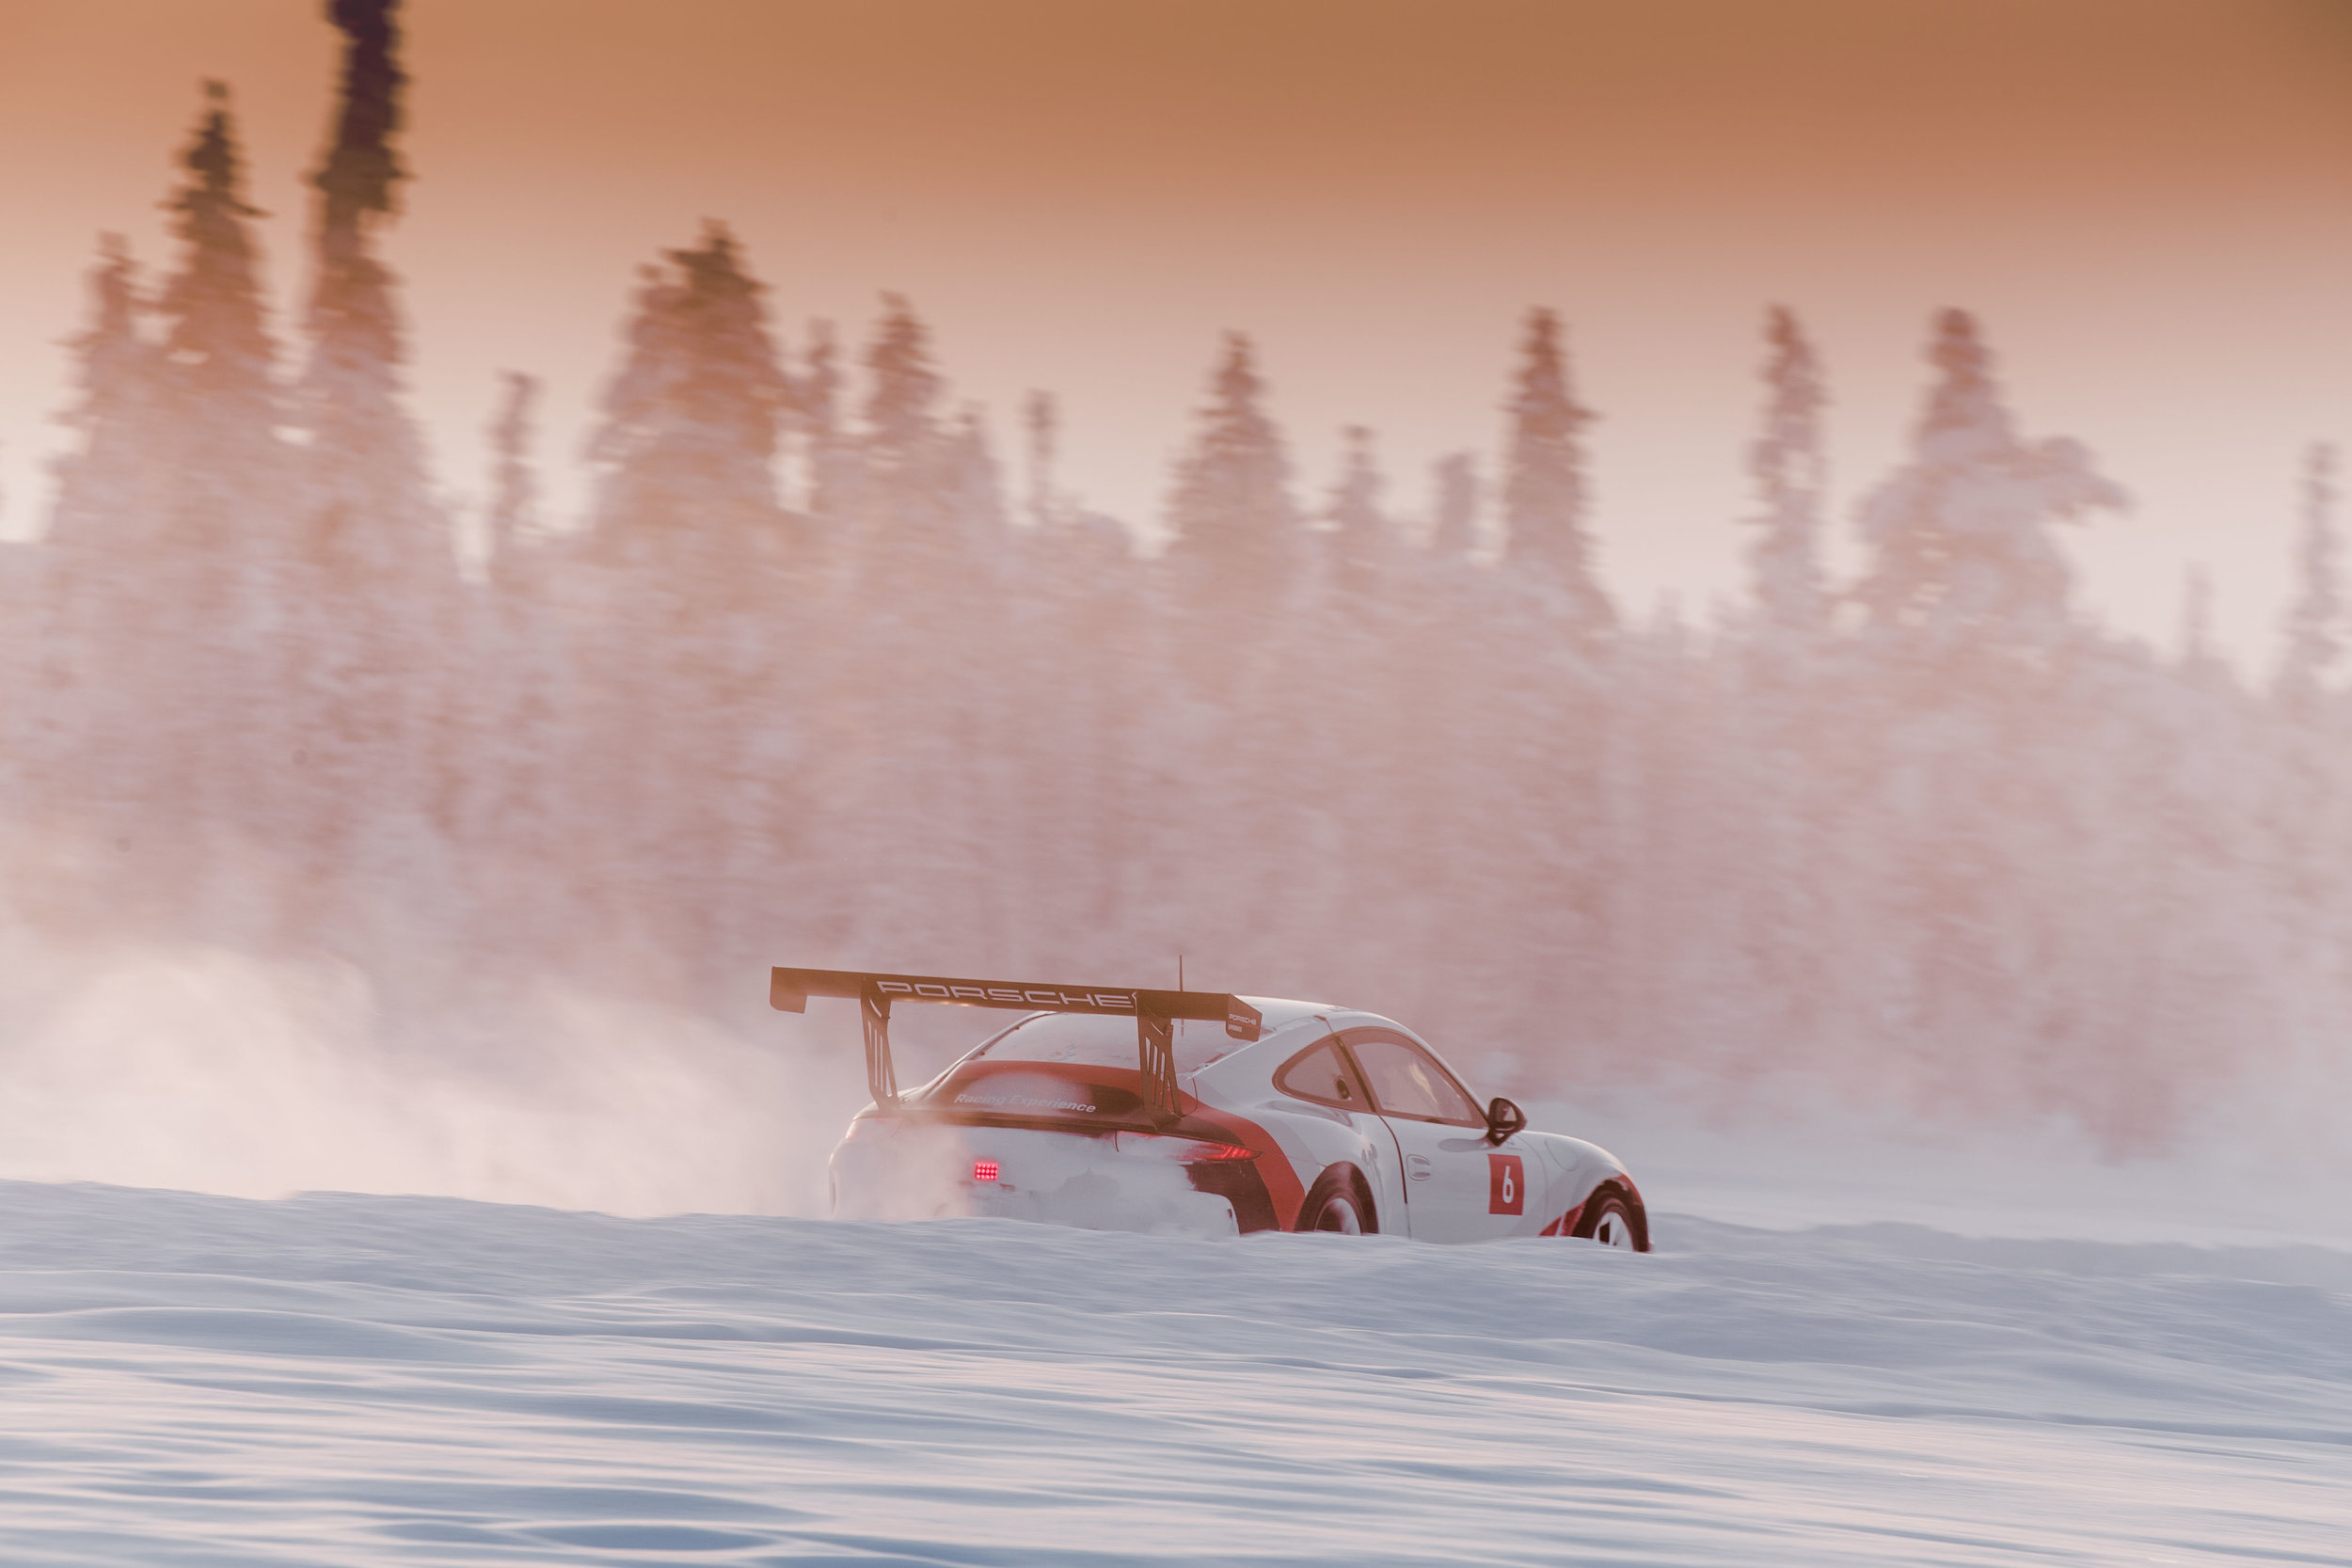 Porsche Ice Experience on Ice_30_01_2019_1082_175782.jpg